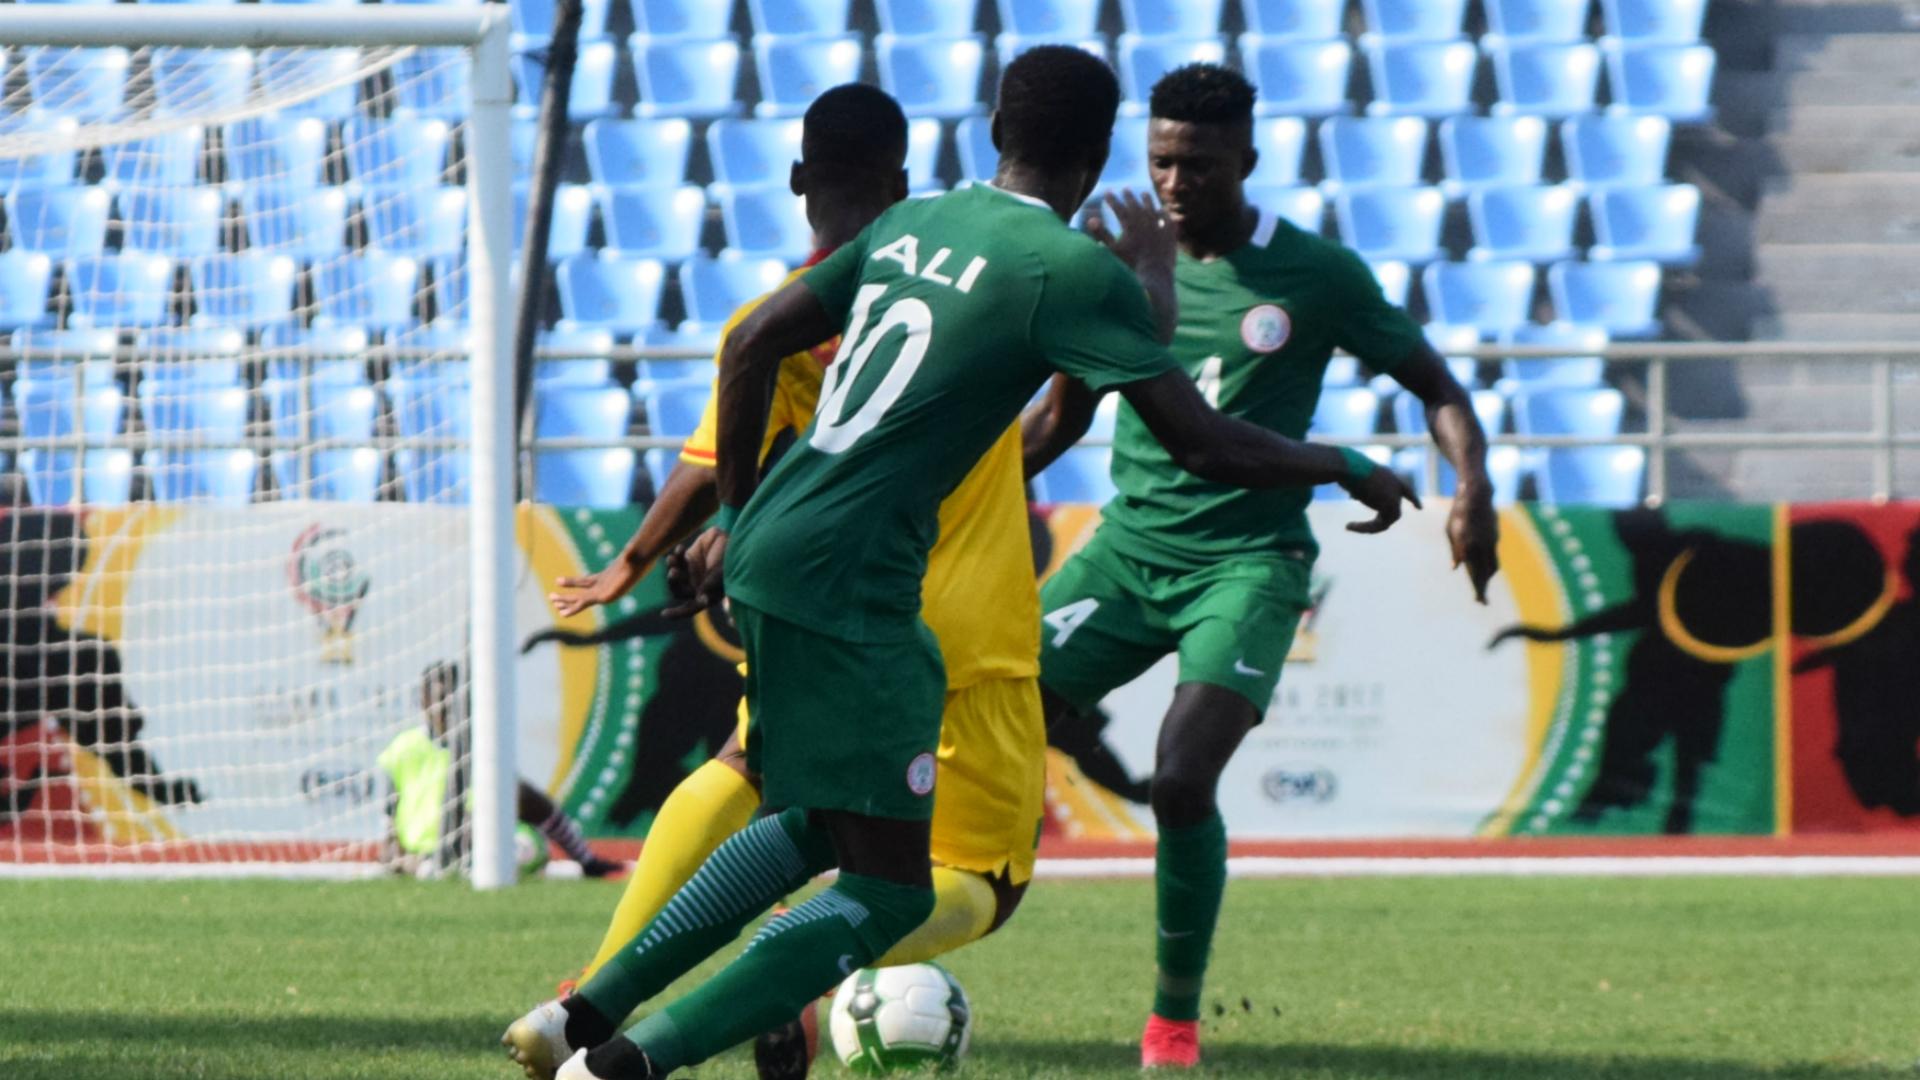 nigeria b vs atletico madrid tv channel live